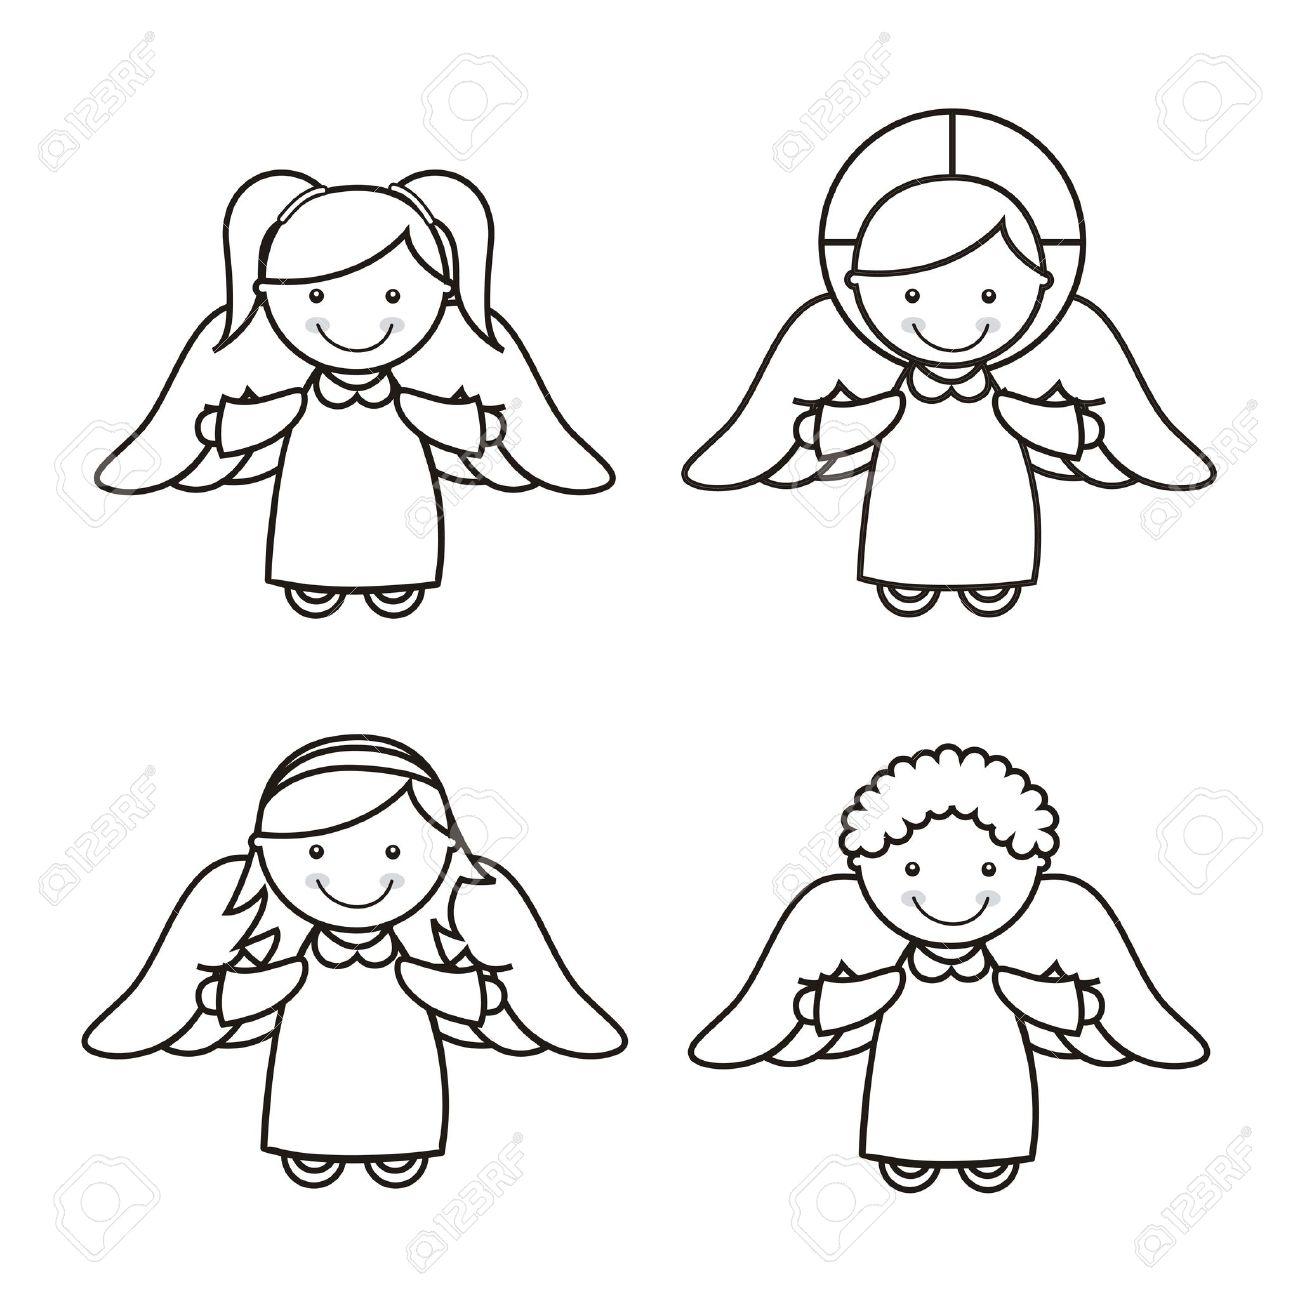 1300x1300 Angel Cartoon Image Group